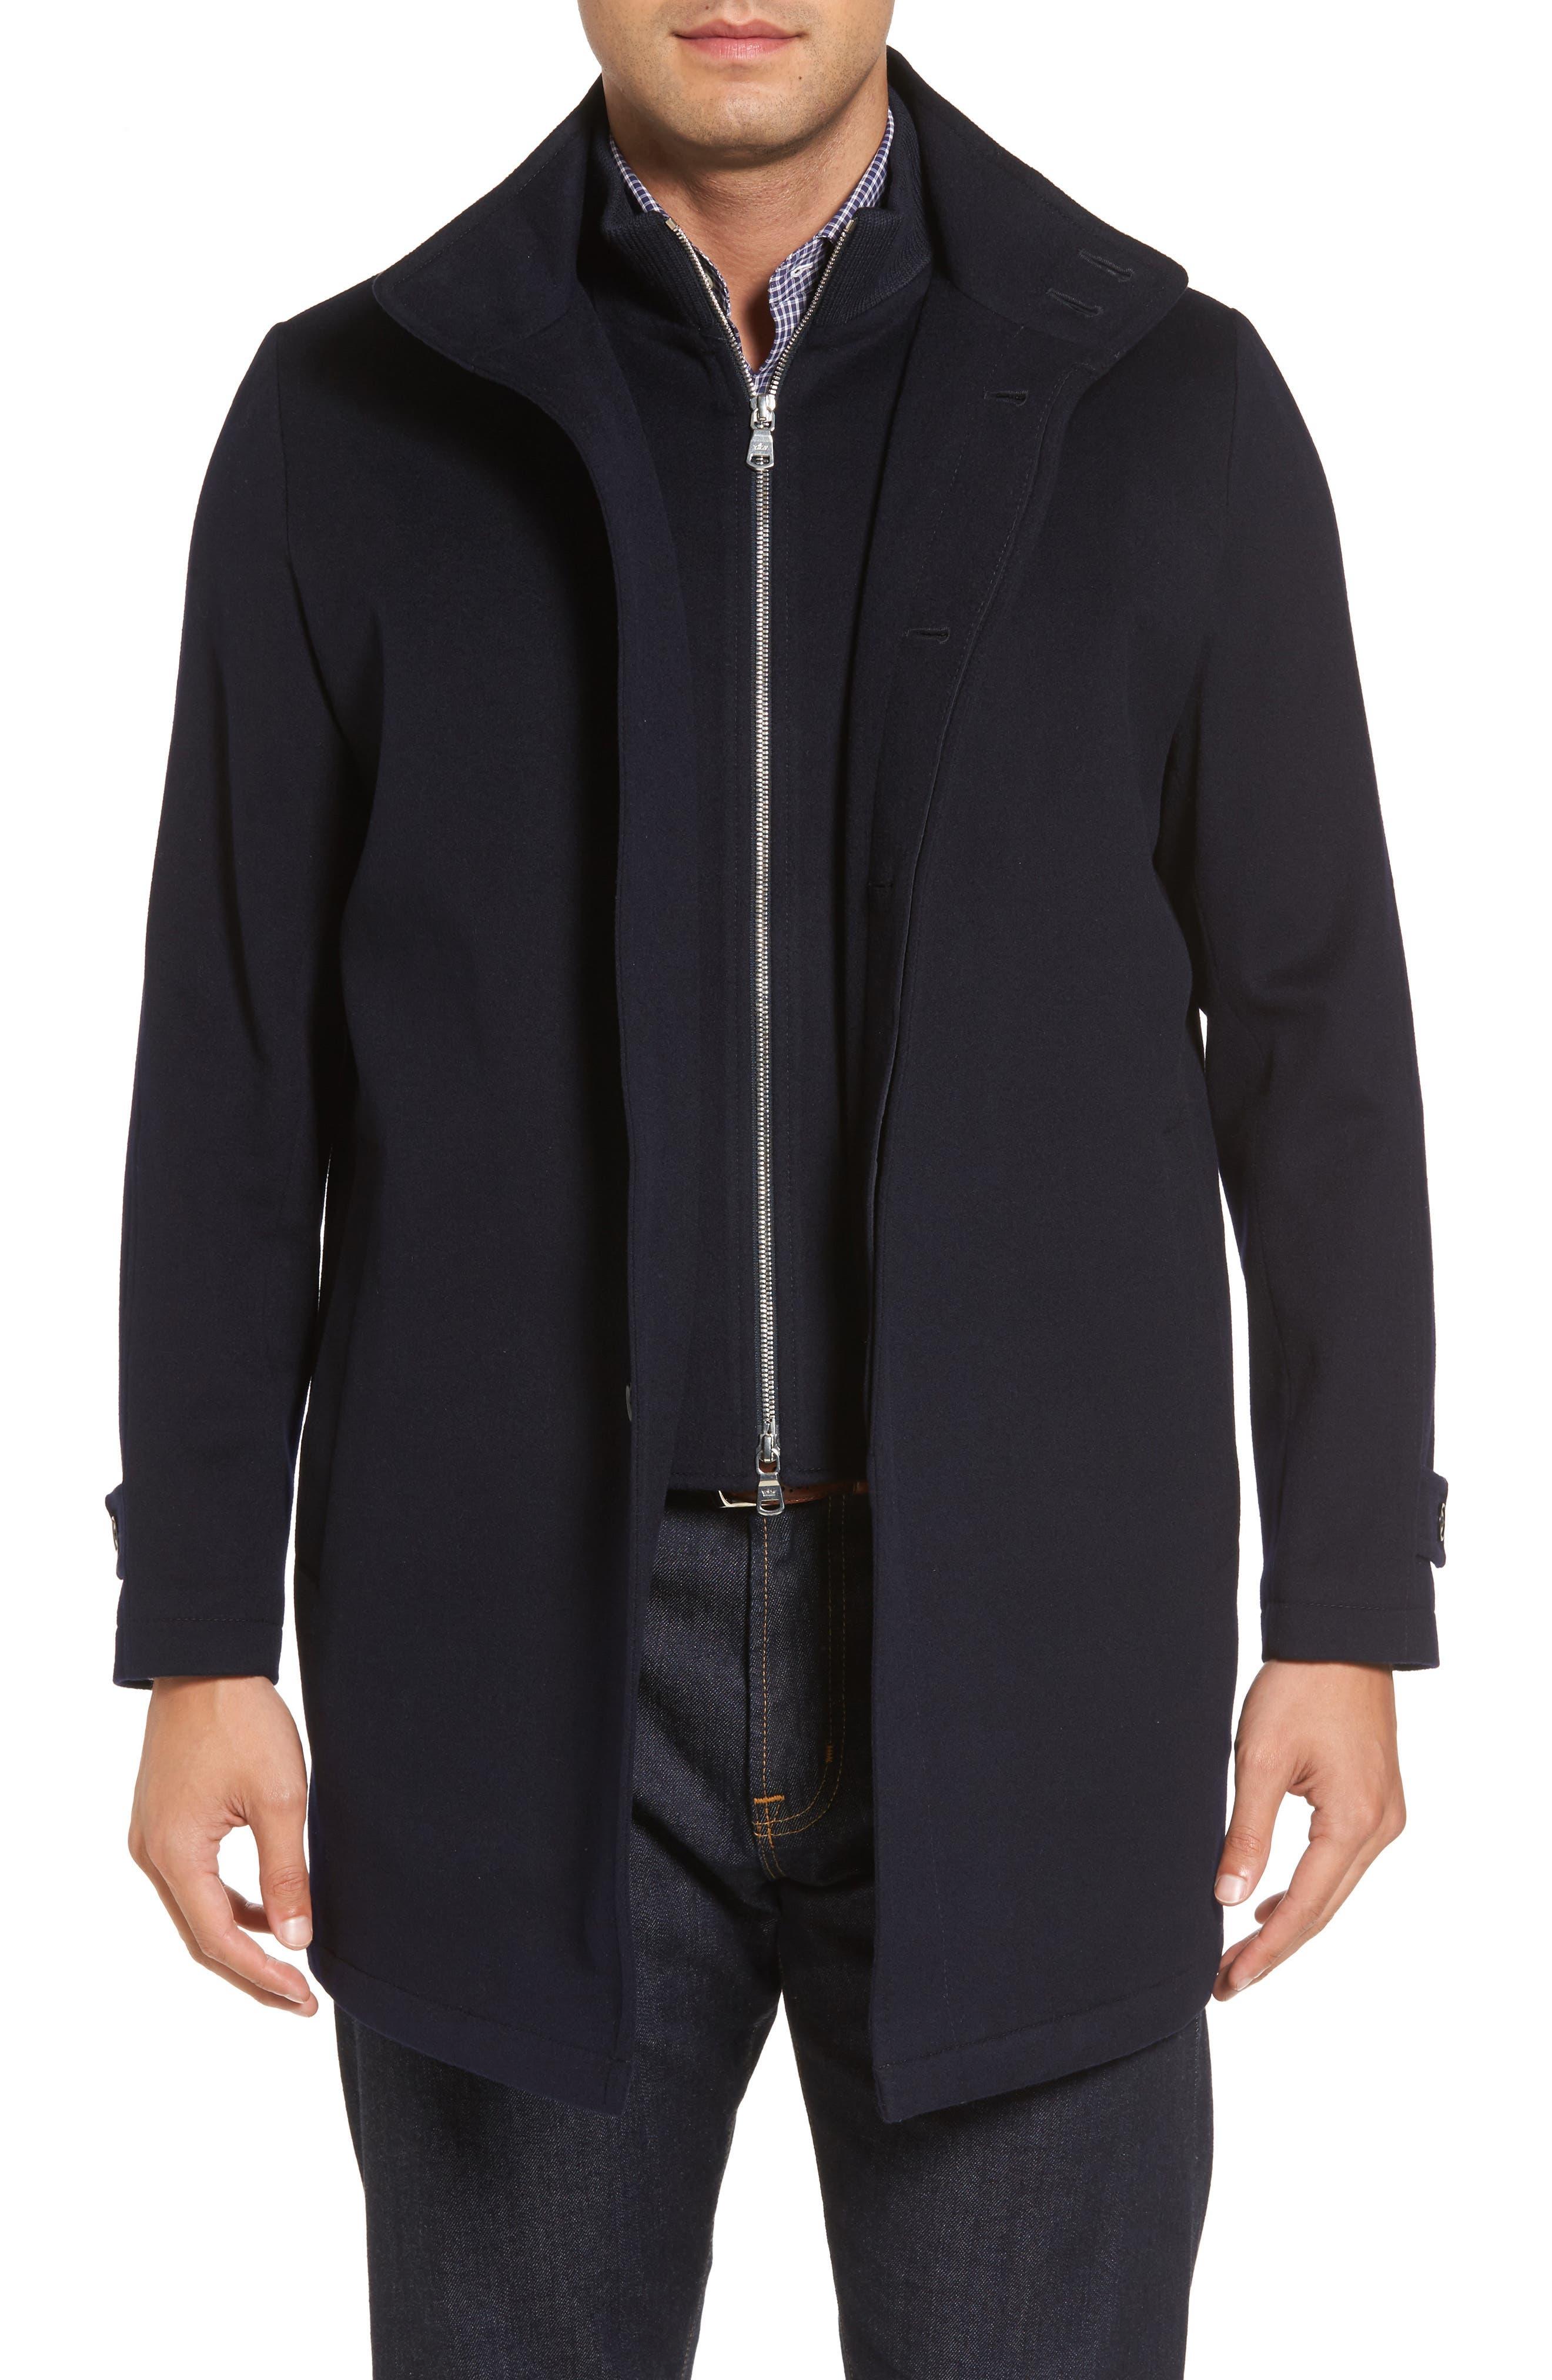 Peter Millar Horizon Wool Overcoat,                         Main,                         color, 001